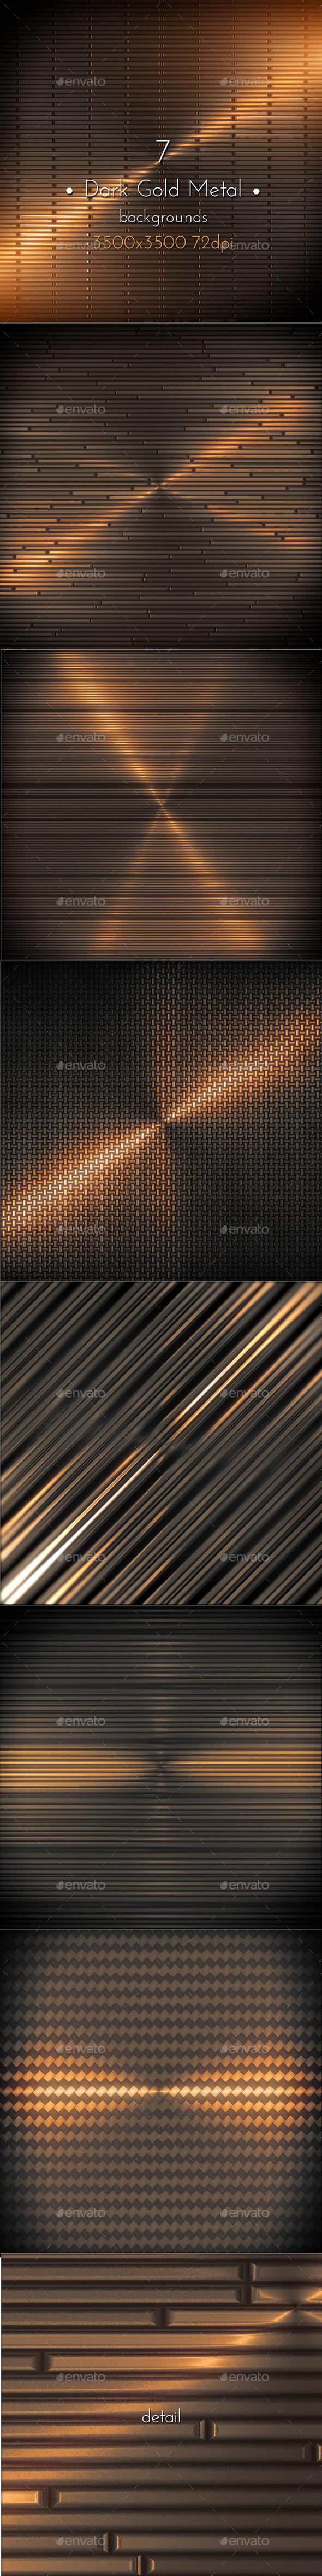 Dark Gold Metal Surface - Tech / Futuristic Backgrounds